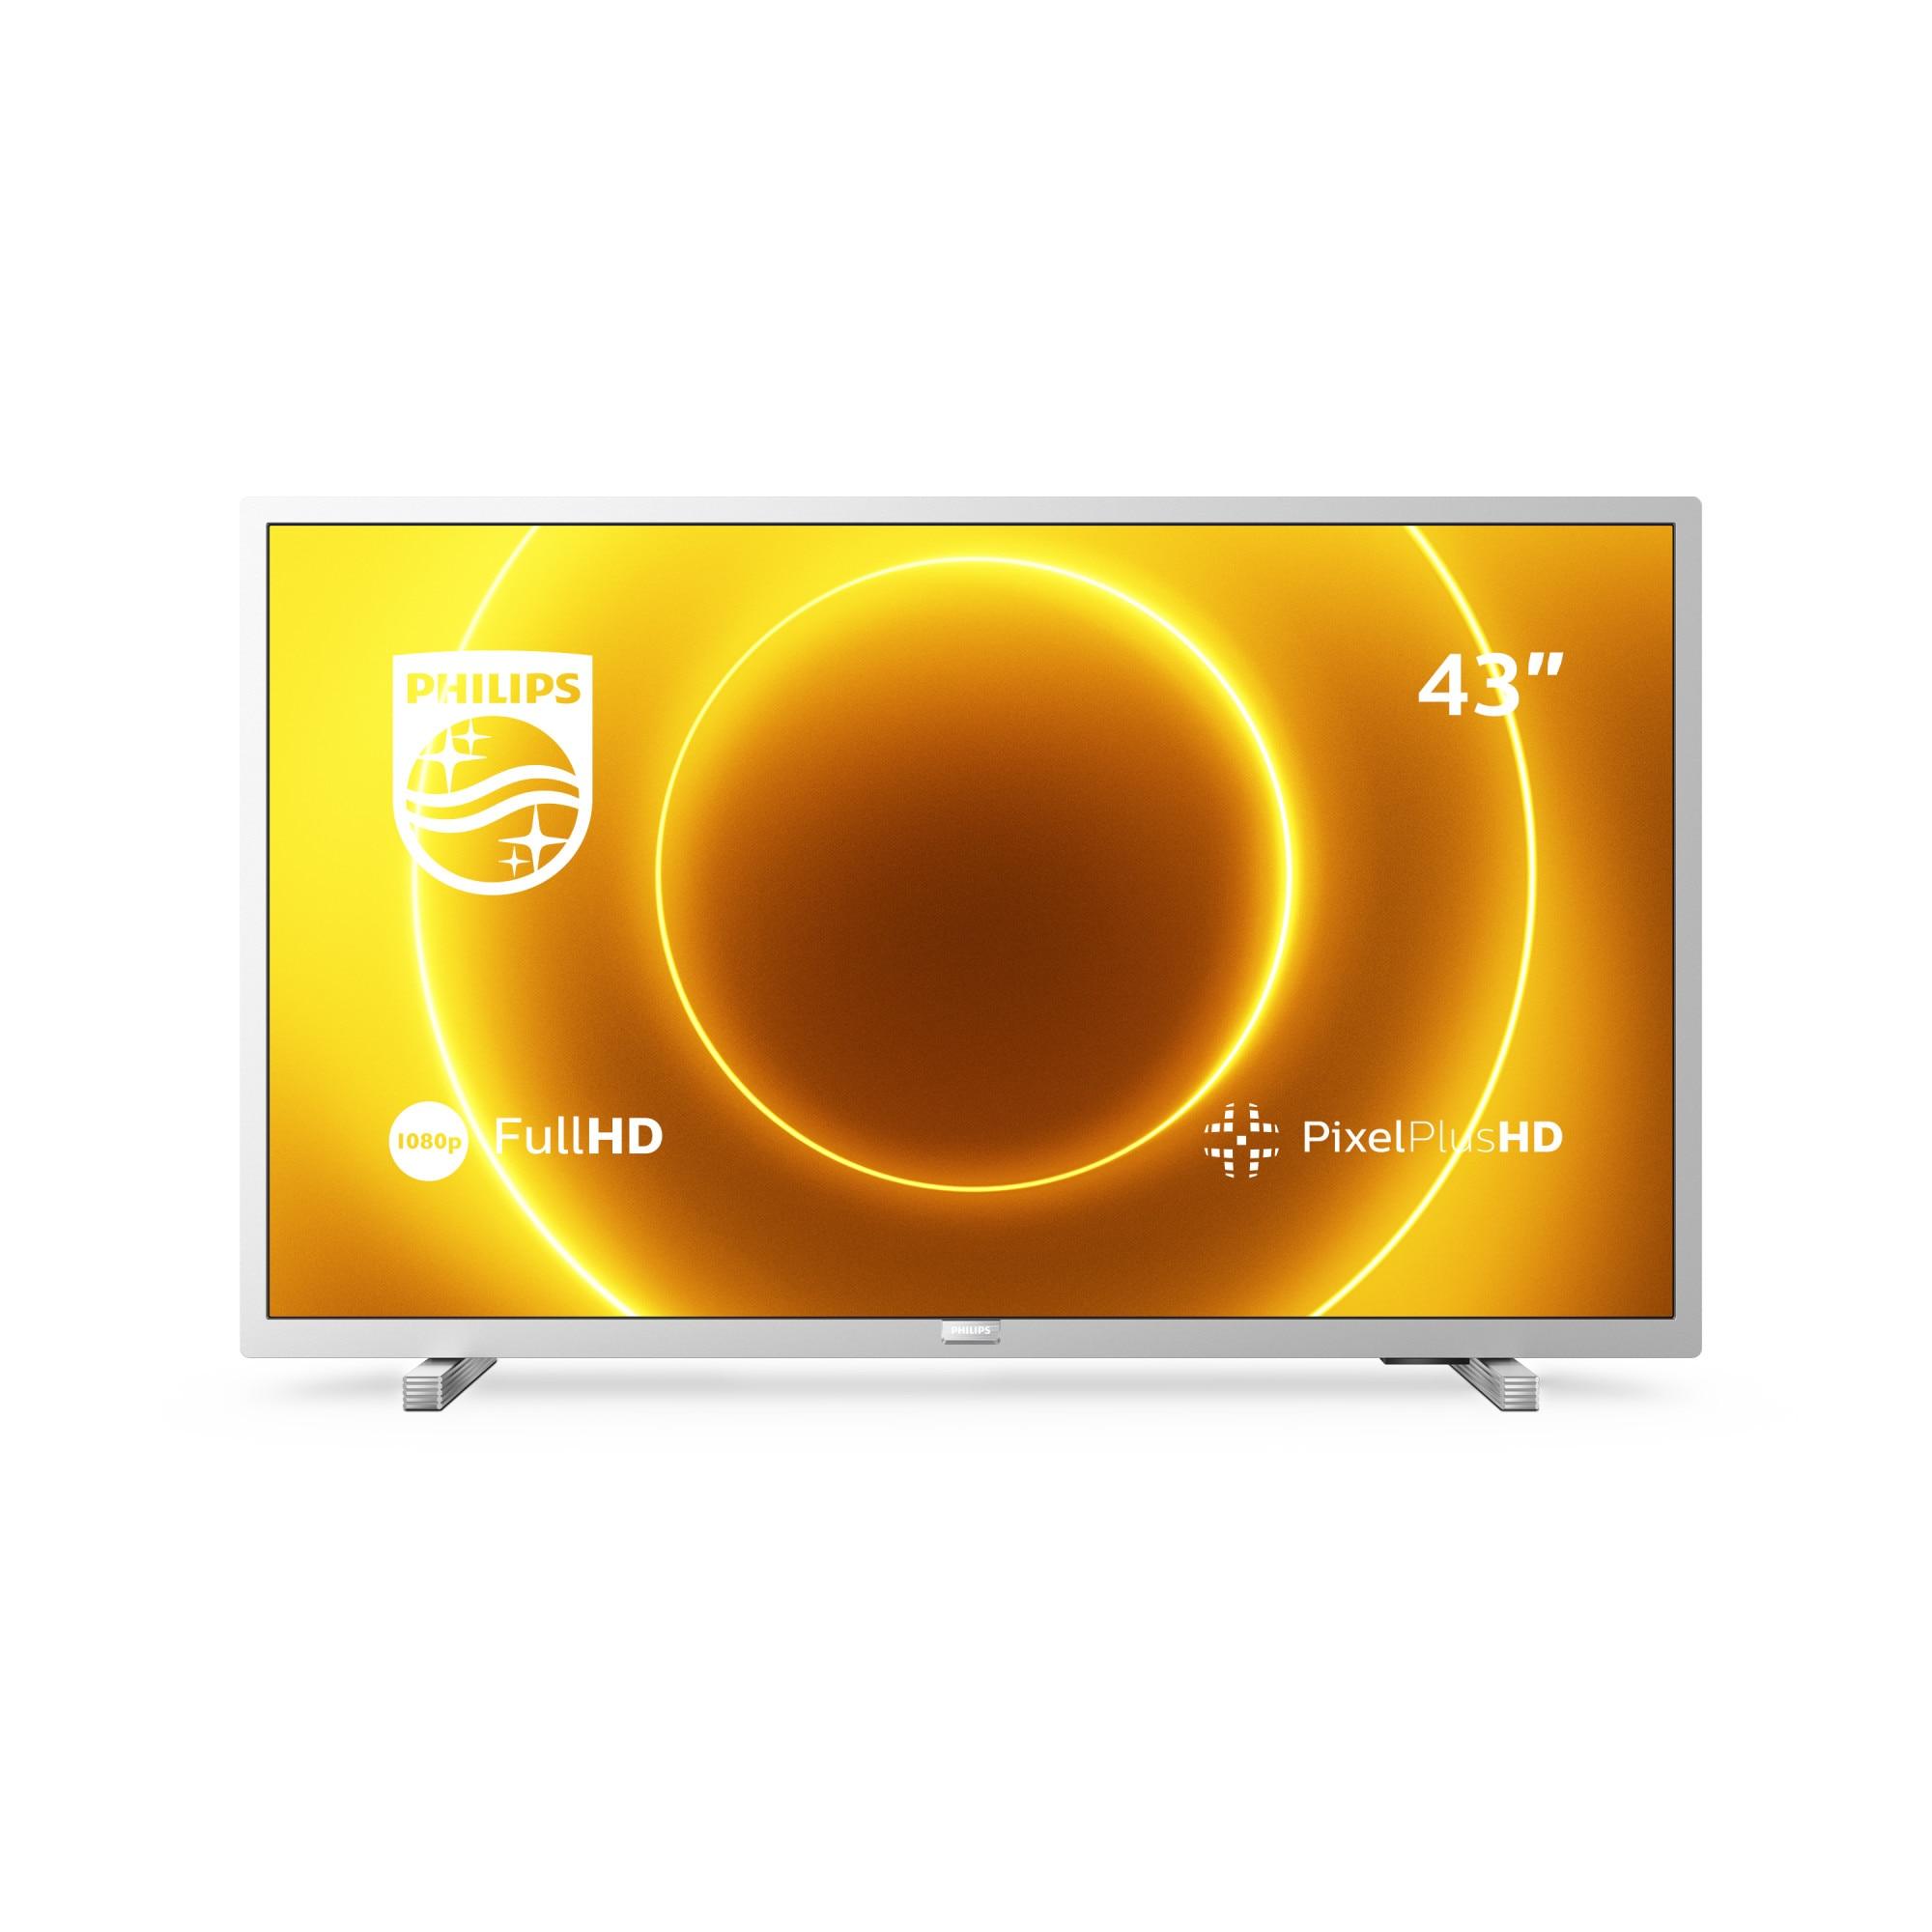 Fotografie Televizor Philips 43PFS5525/12, 108 cm, Full HD, LED, Clasa A+